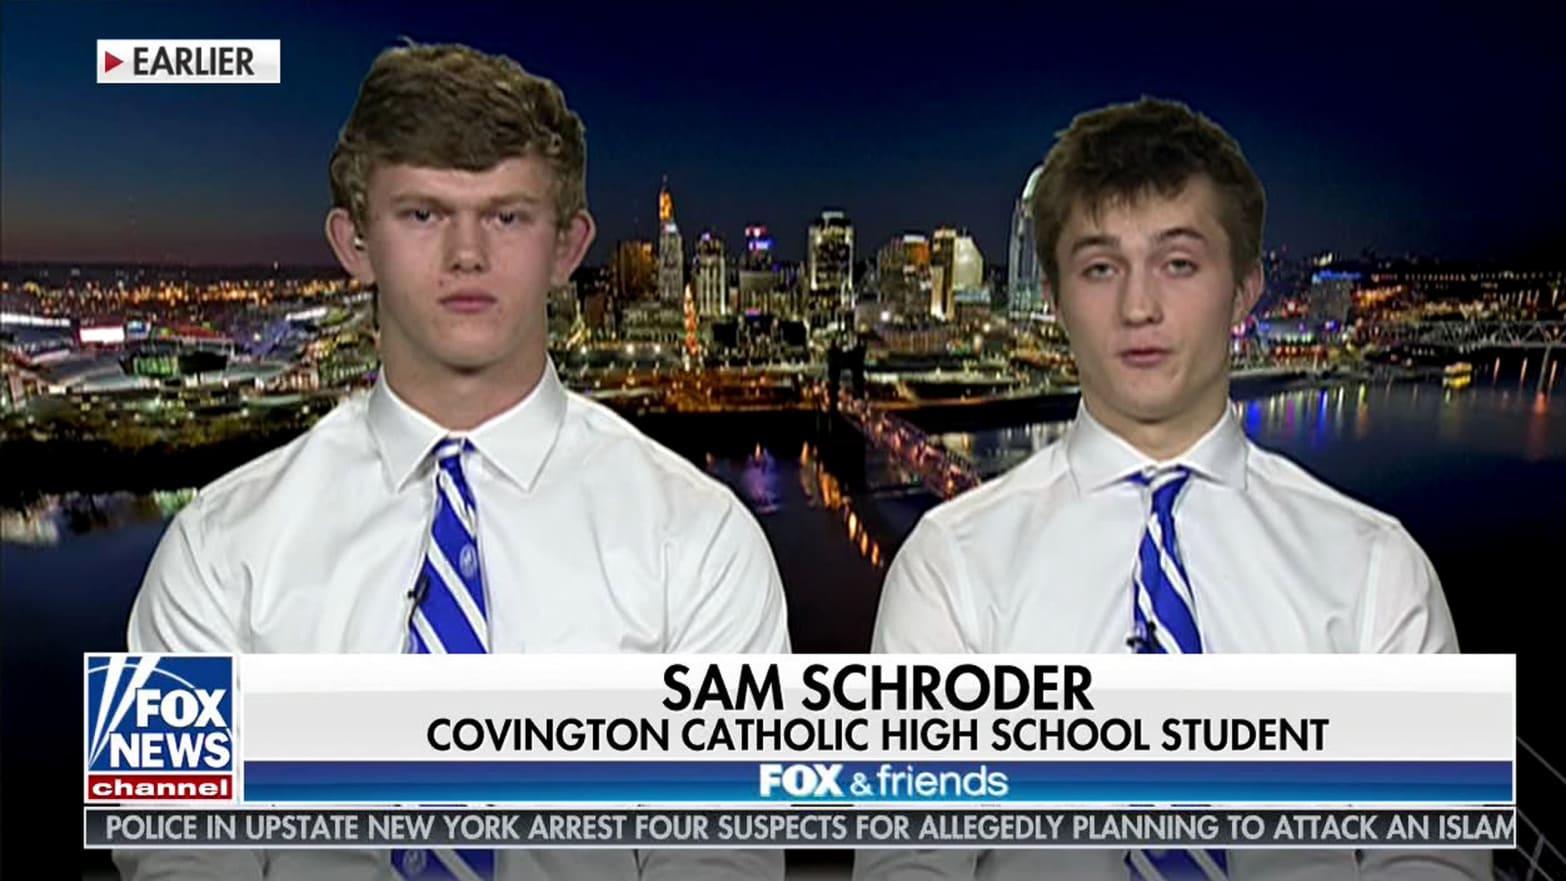 Covington Catholic Teen on 'Fox & Friends': Blackface Is 'School Spirit'